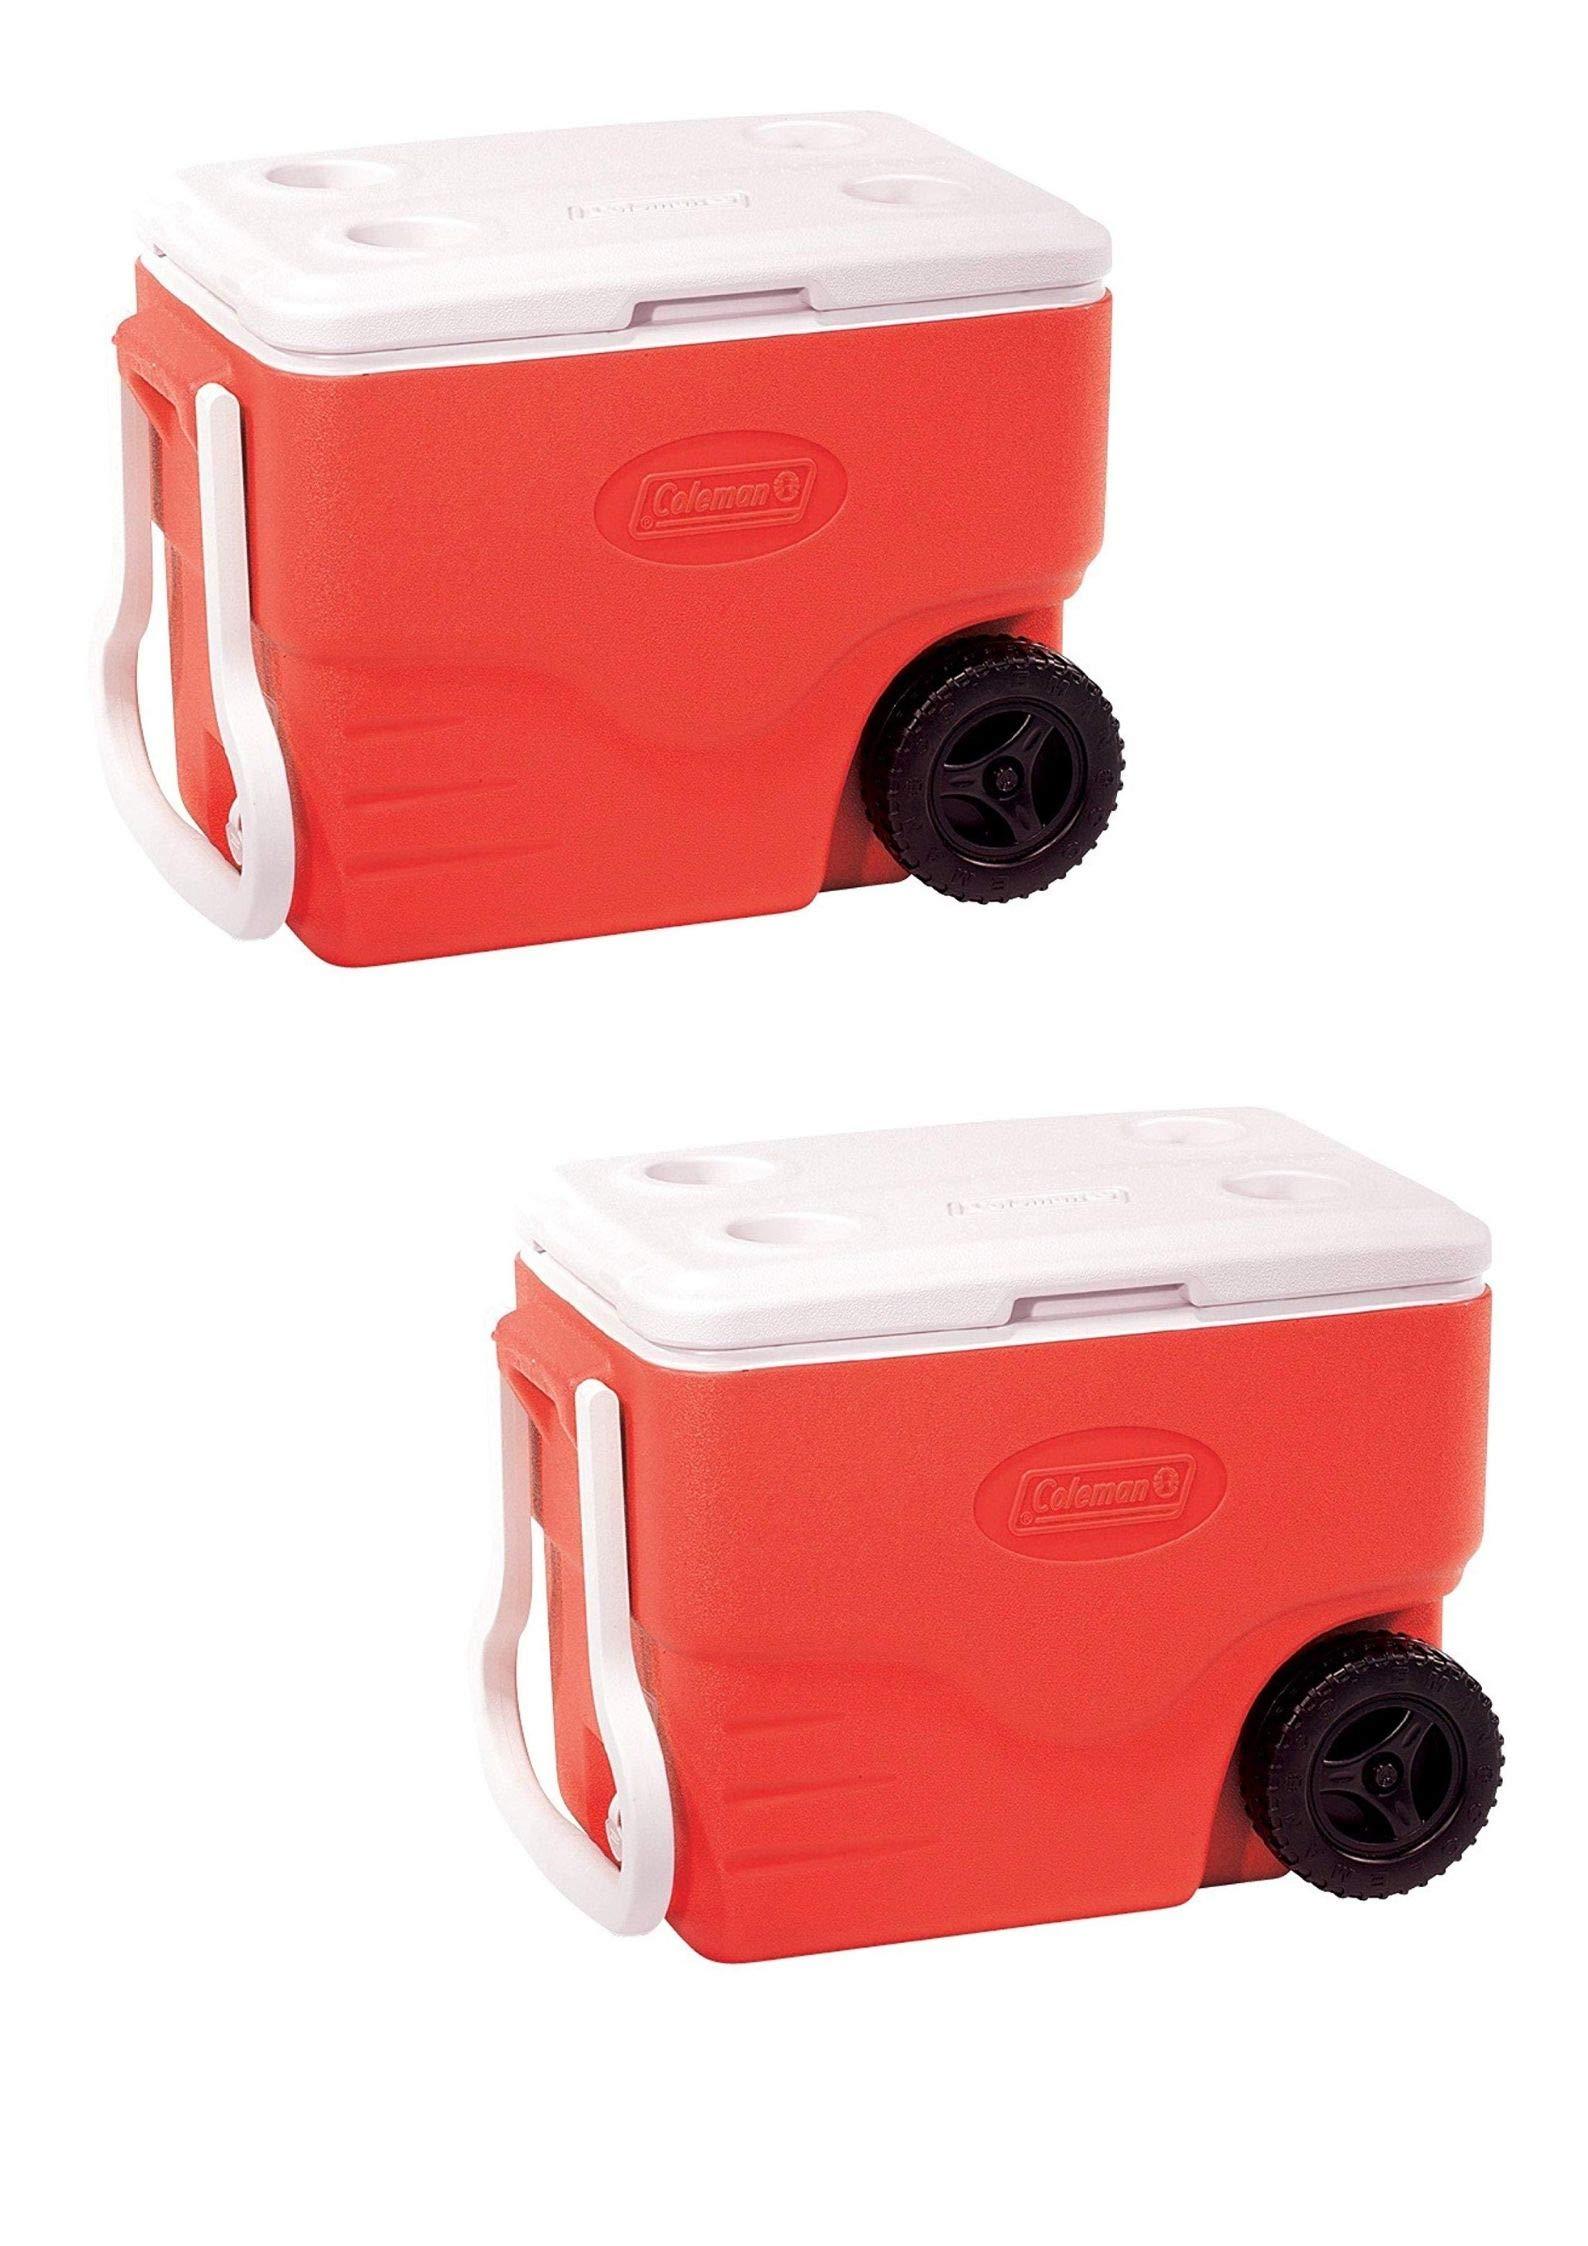 Coleman Performance Wheeled Cooler, 40 Quart (Red/Set of 2)